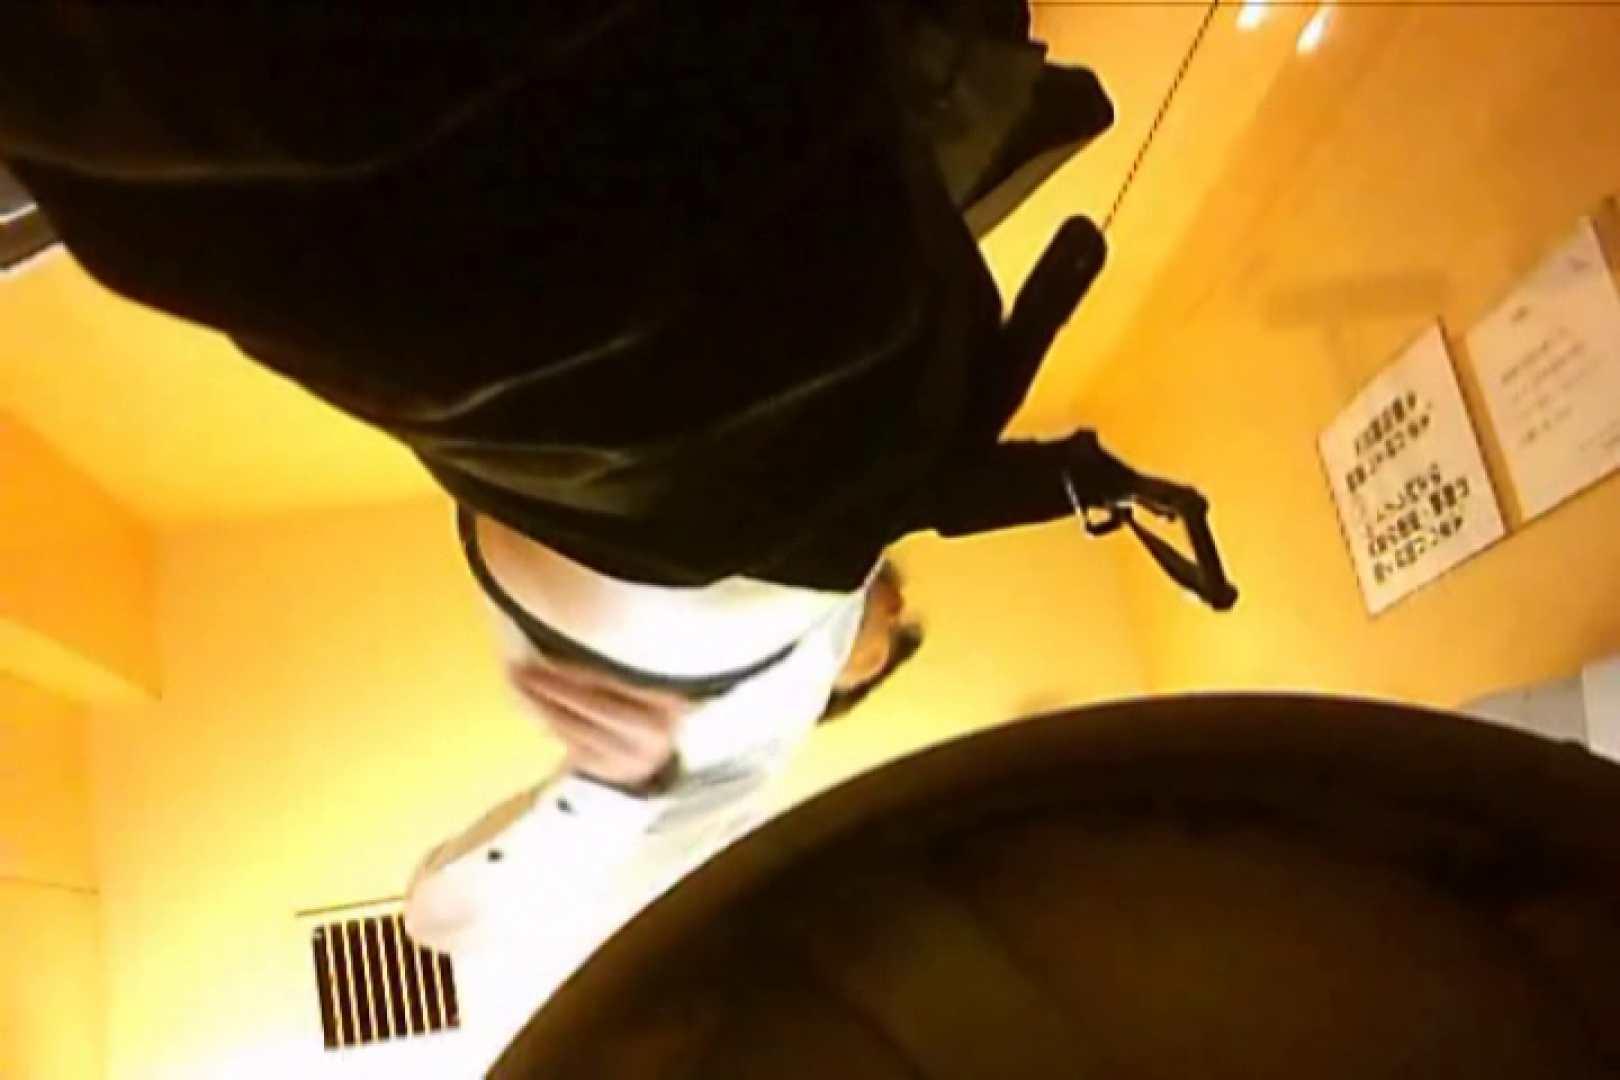 SEASON 2ND!掴み取りさんの洗面所覗き!in新幹線!VOL.03 スーツボーイズ | ボーイズ私服  76pic 27